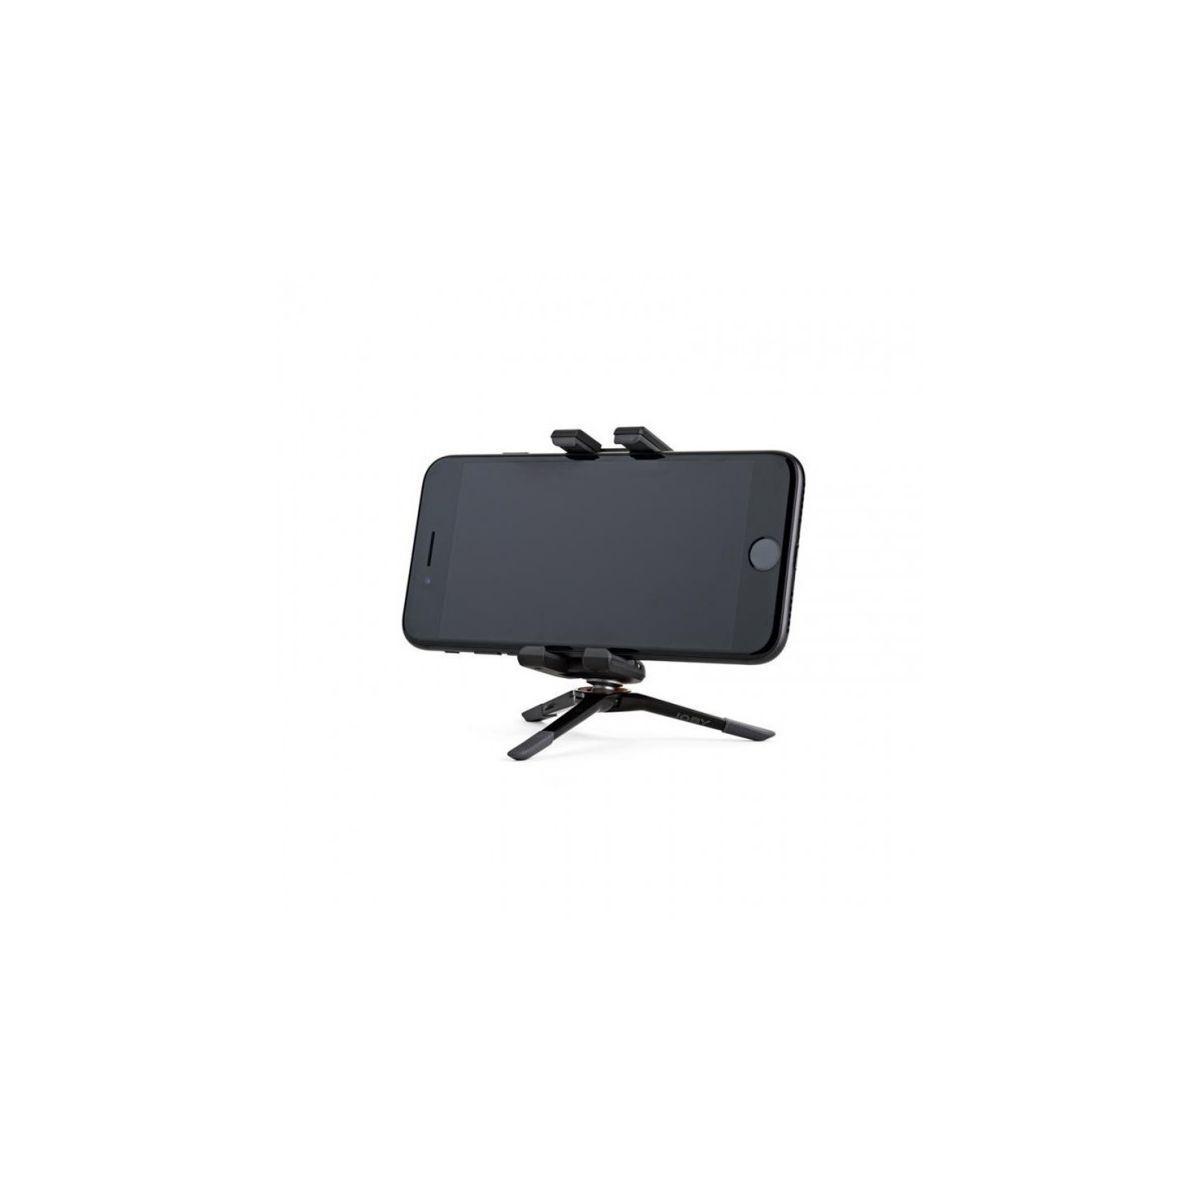 Support smartphone joby griptight one micro stand noir - livraison offerte : code liv (photo)